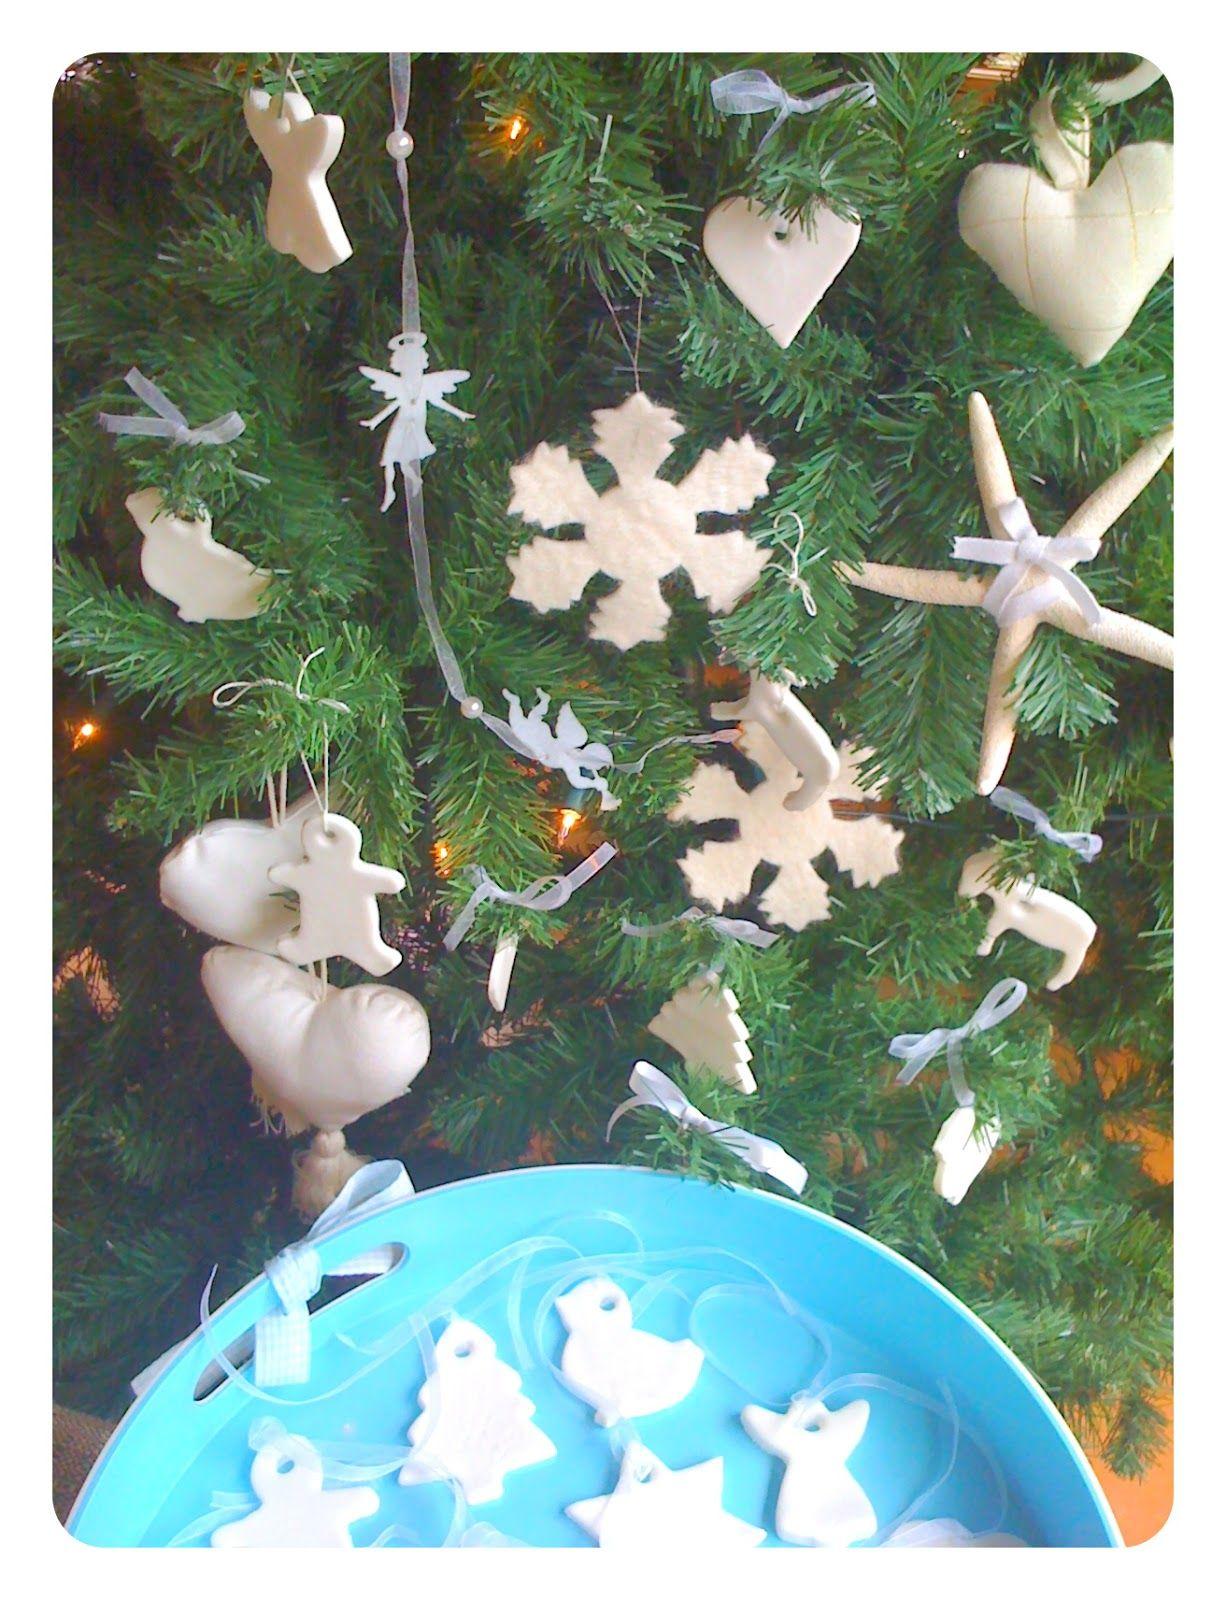 Alessandra Zecchini White Christmas Tree Decorations Made White Christmas Tree Decorations Christmas Tree Decorations White Christmas Tree